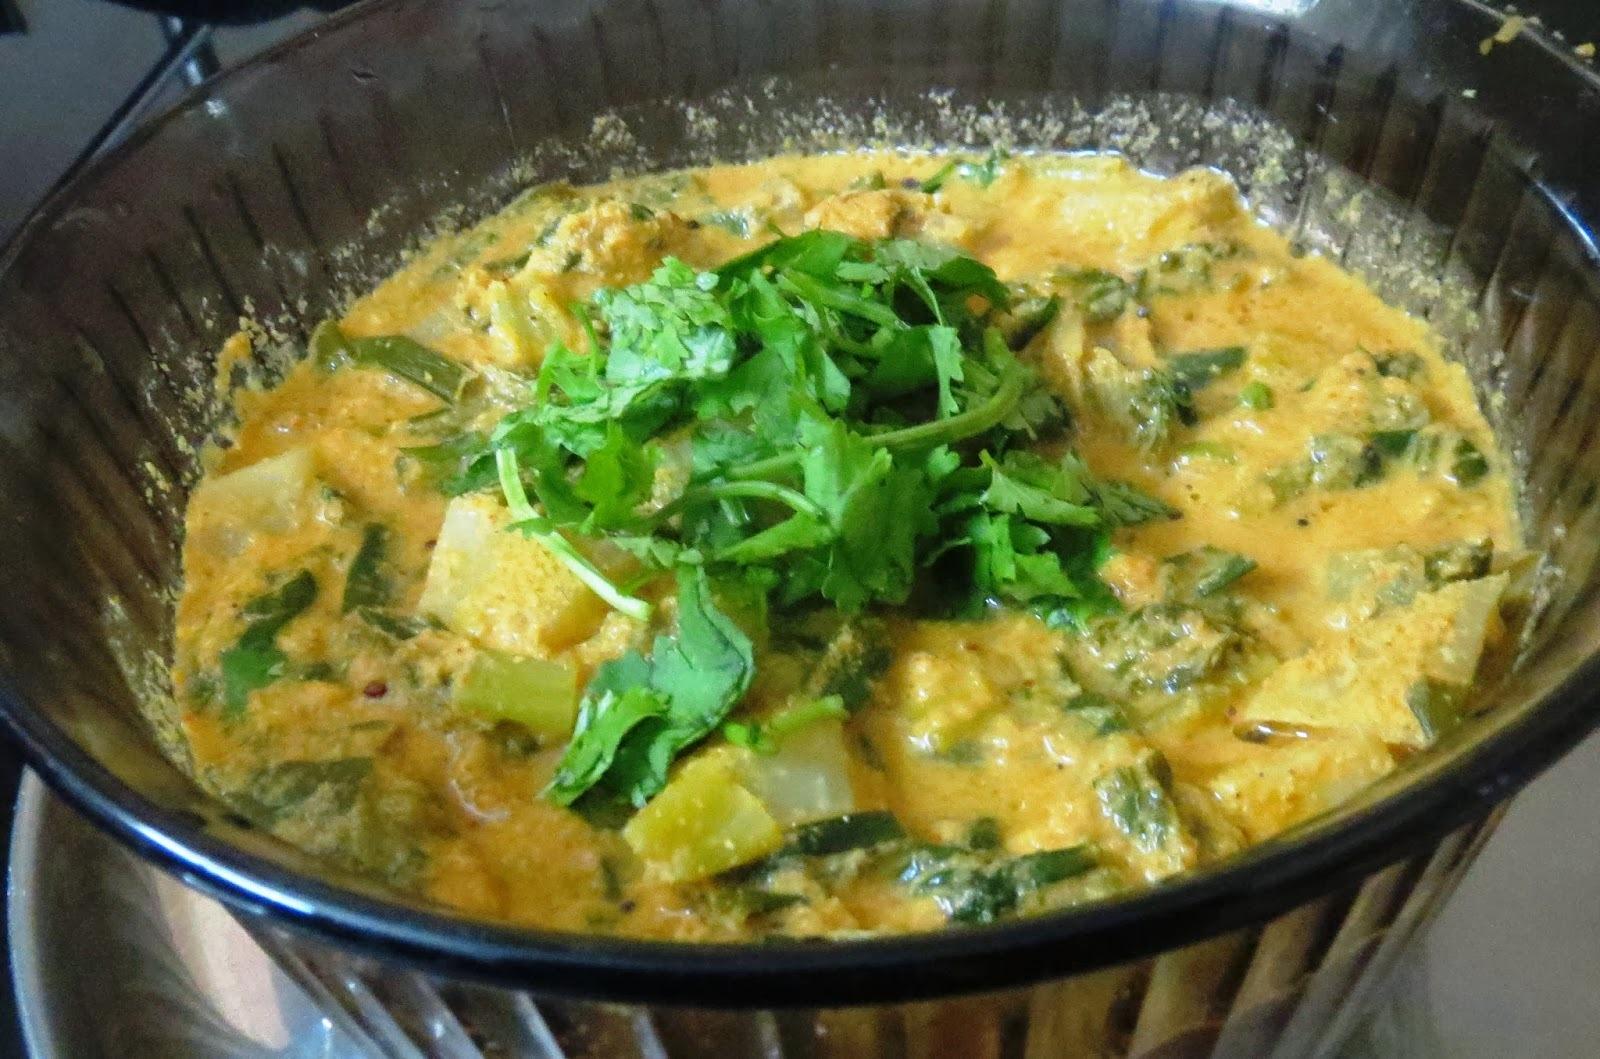 Spring Onions + Knol khol Curry (Huli)